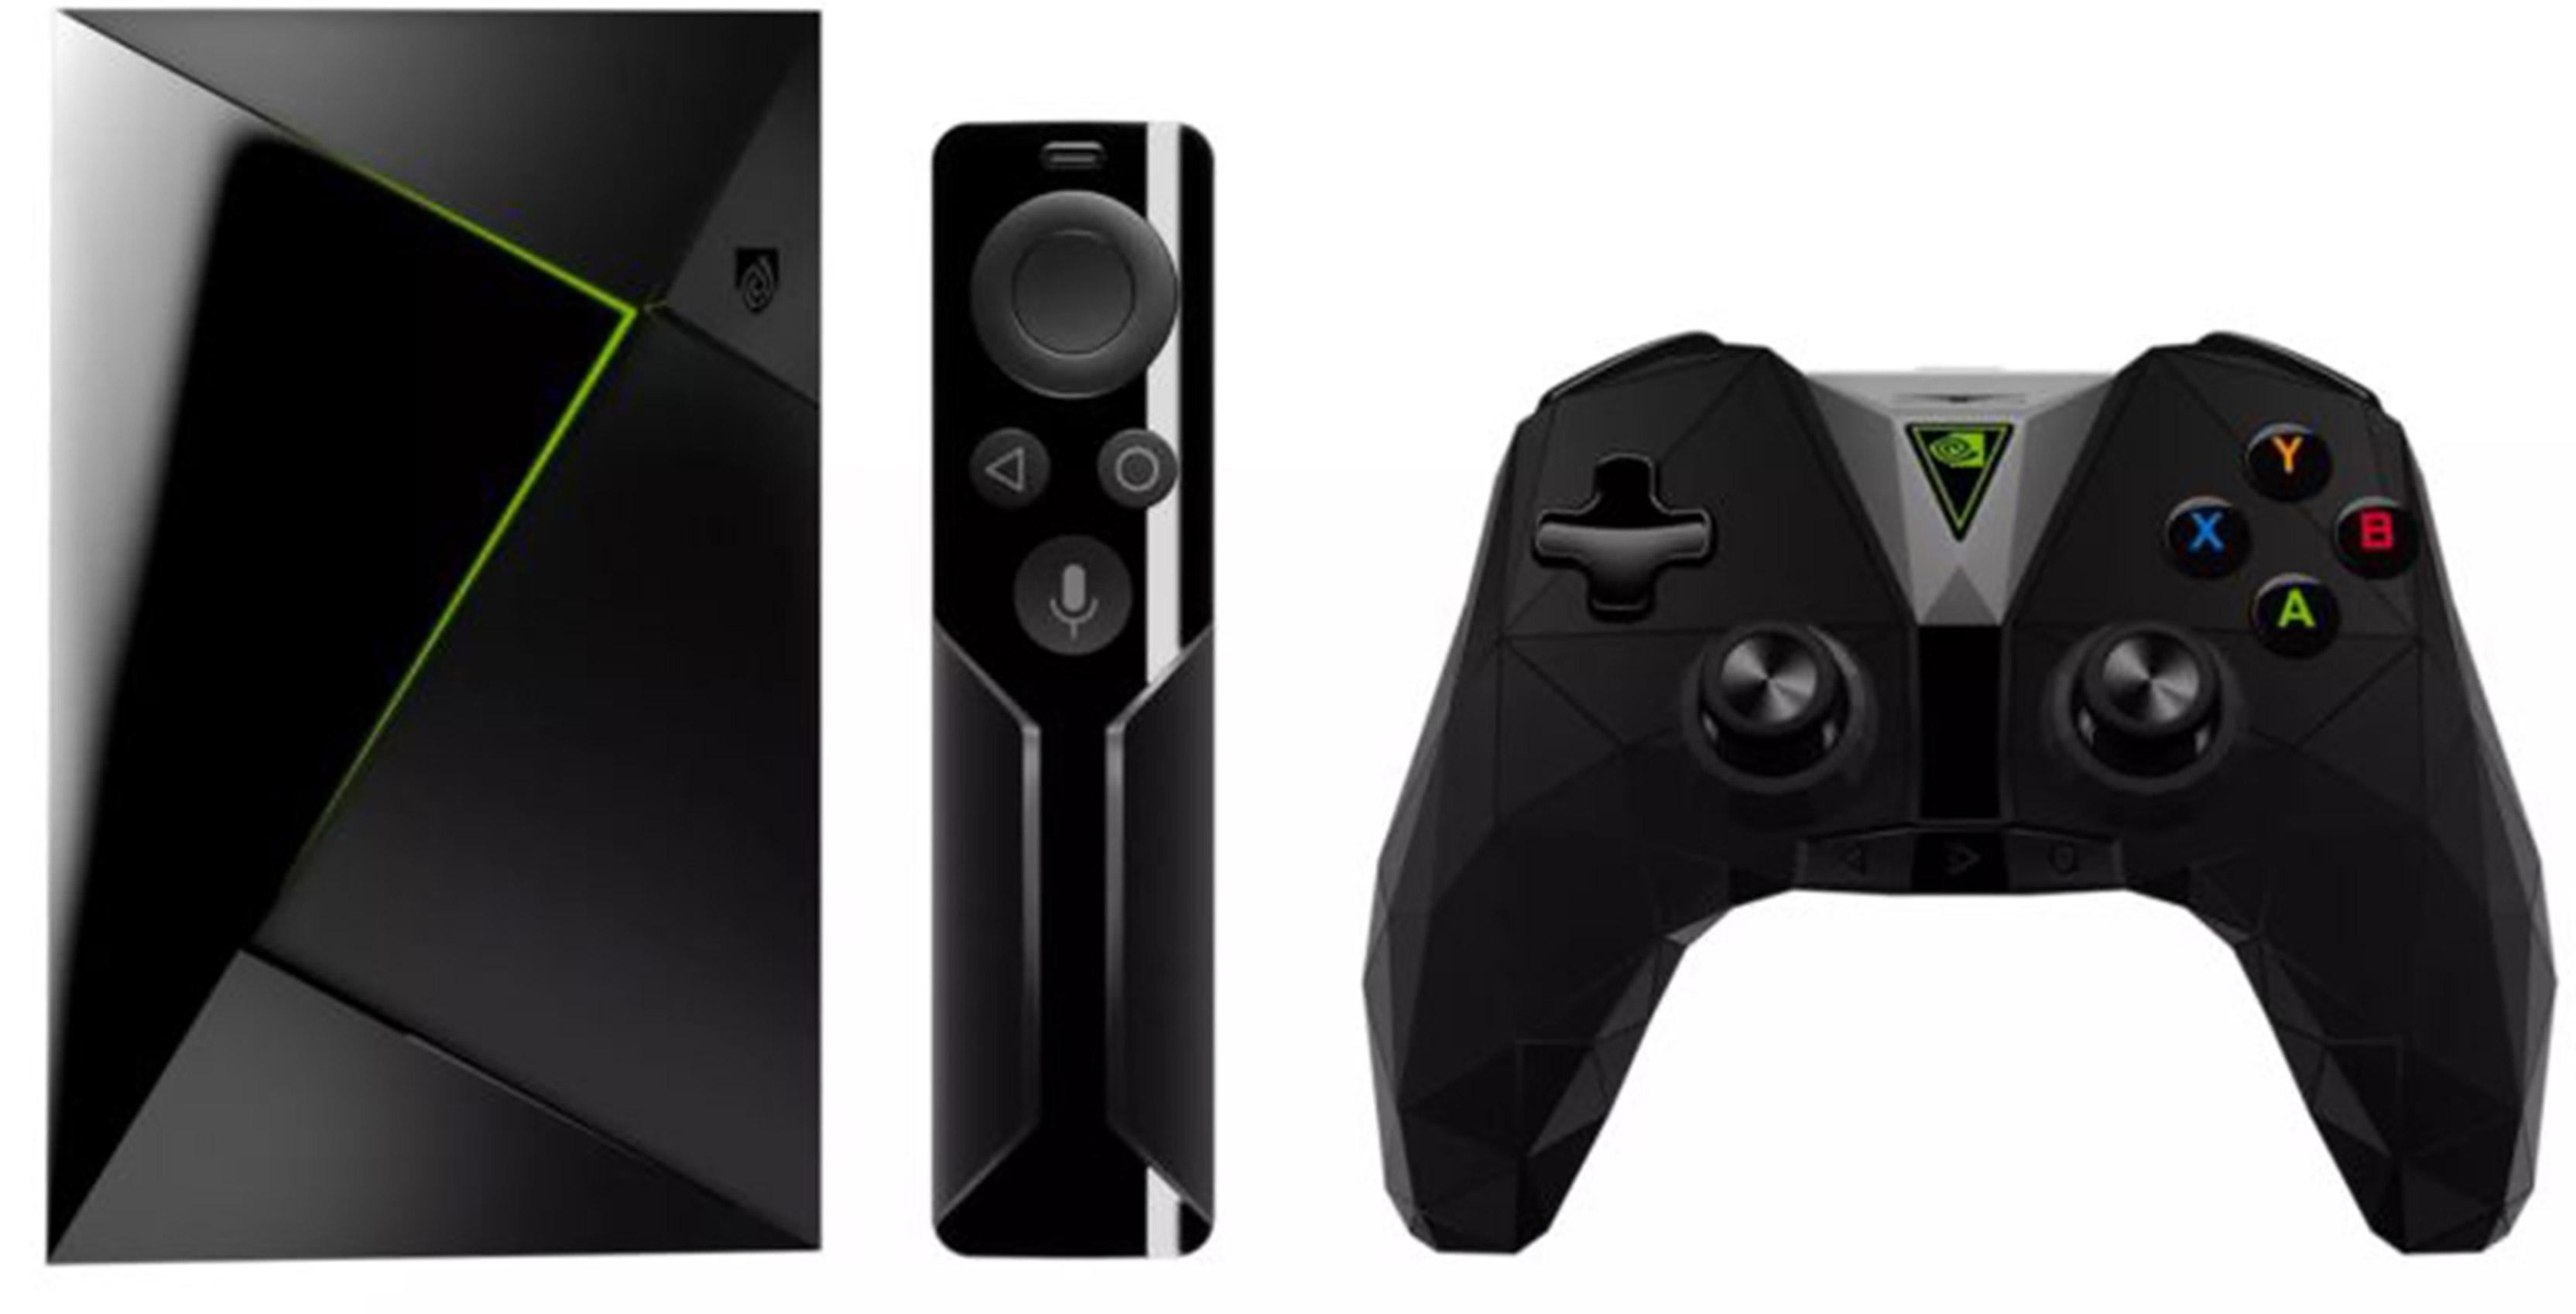 Nvidia's shield set-top box